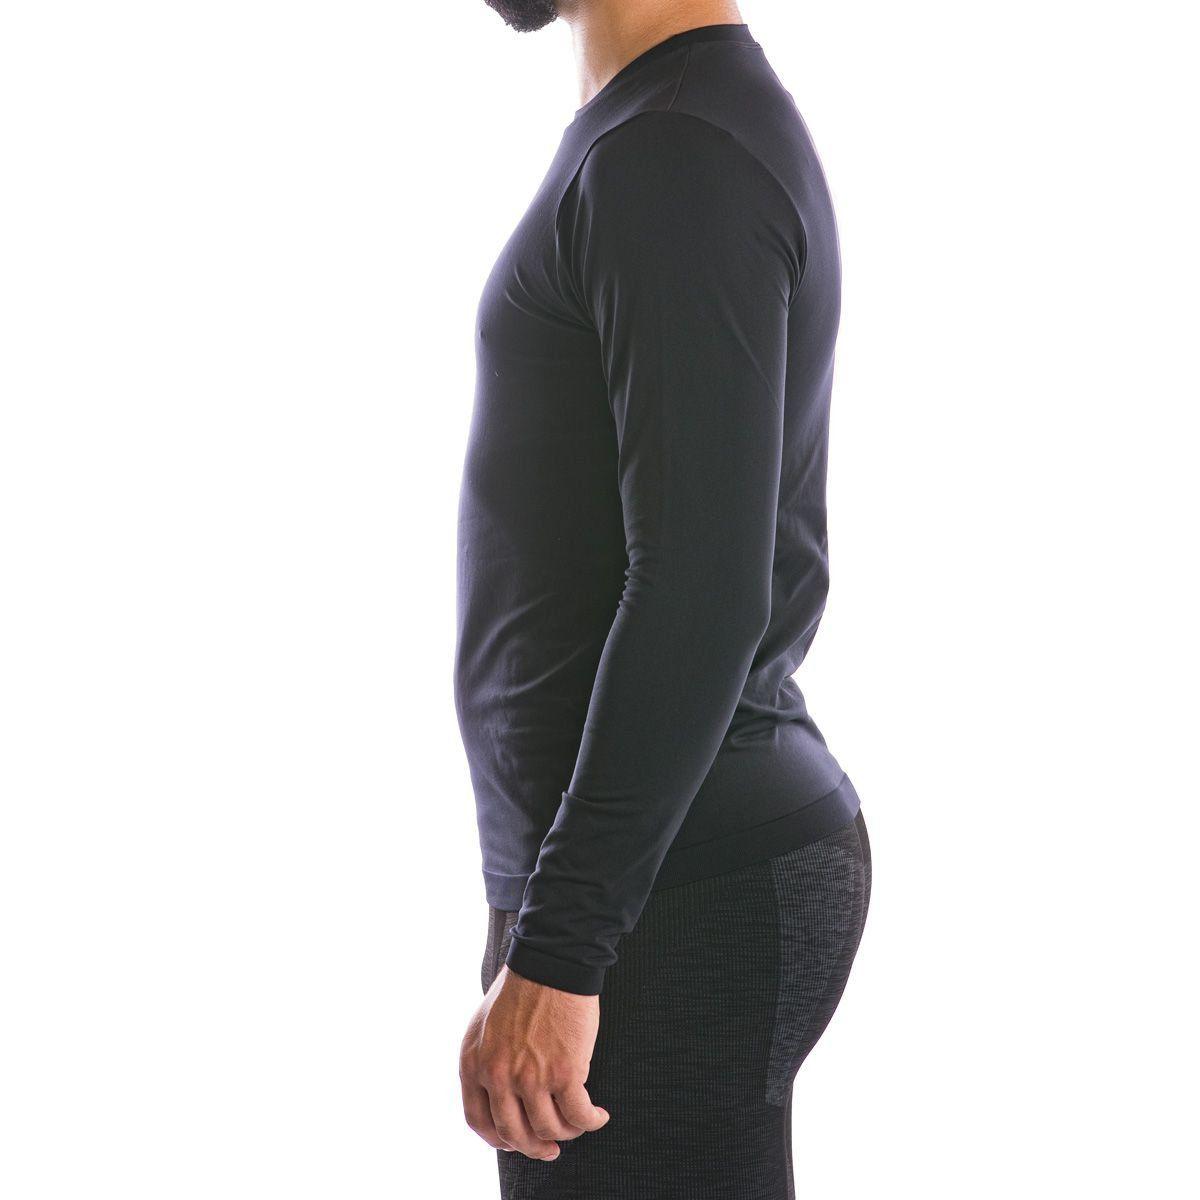 Camiseta Lupo Warm Masculina Manga Longa térmica